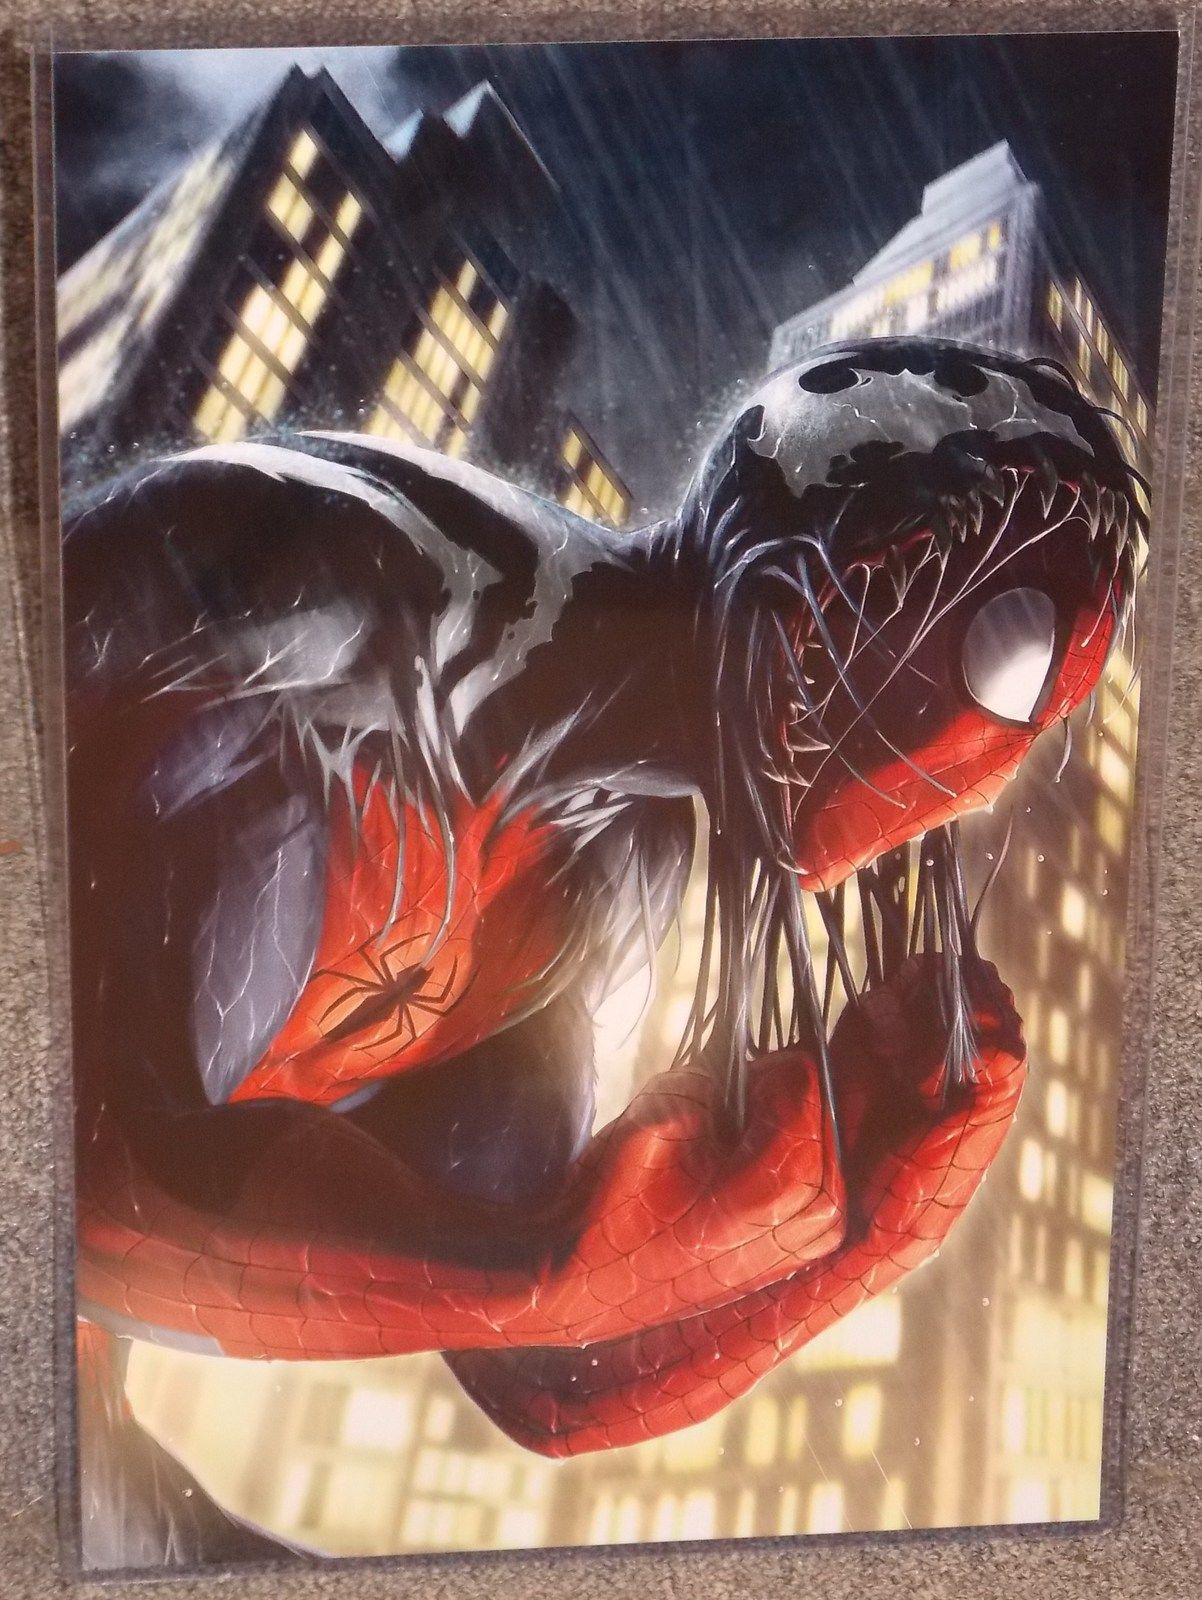 Marvel Spider-Man Glossy Print 11 x 17 In Hard Plastic Sleeve